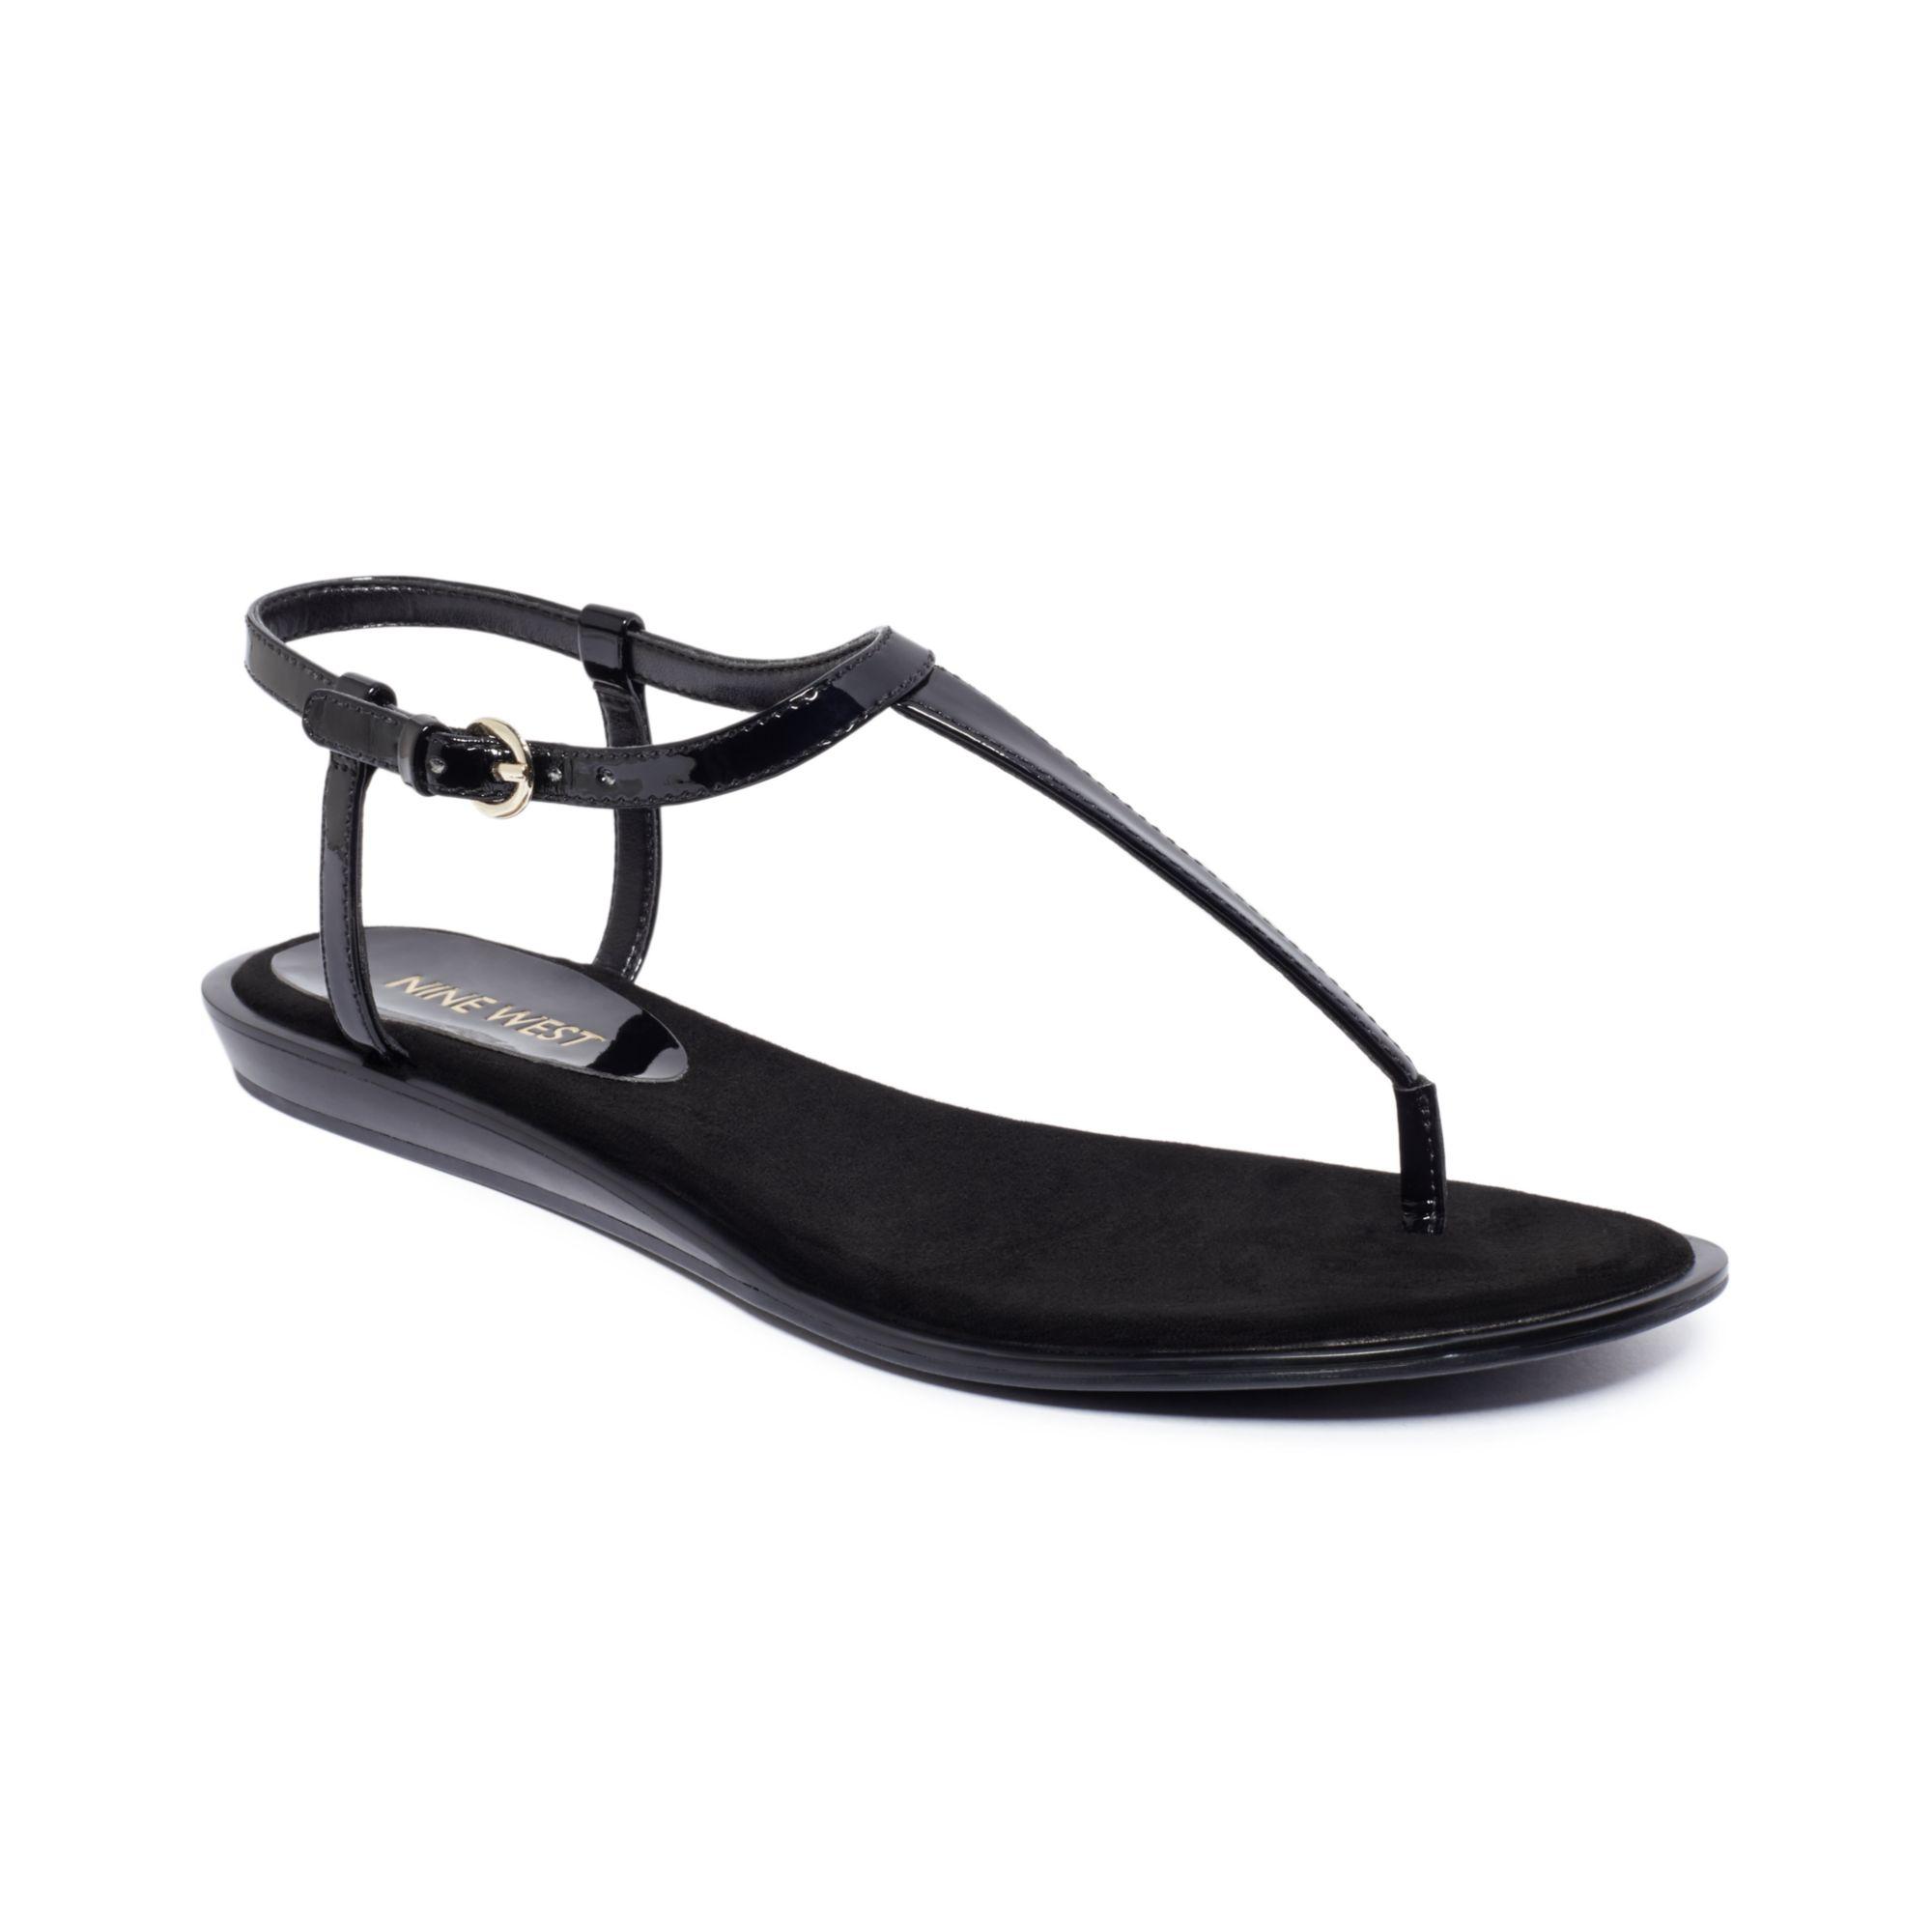 Nine West Venga Thong Sandals in Black